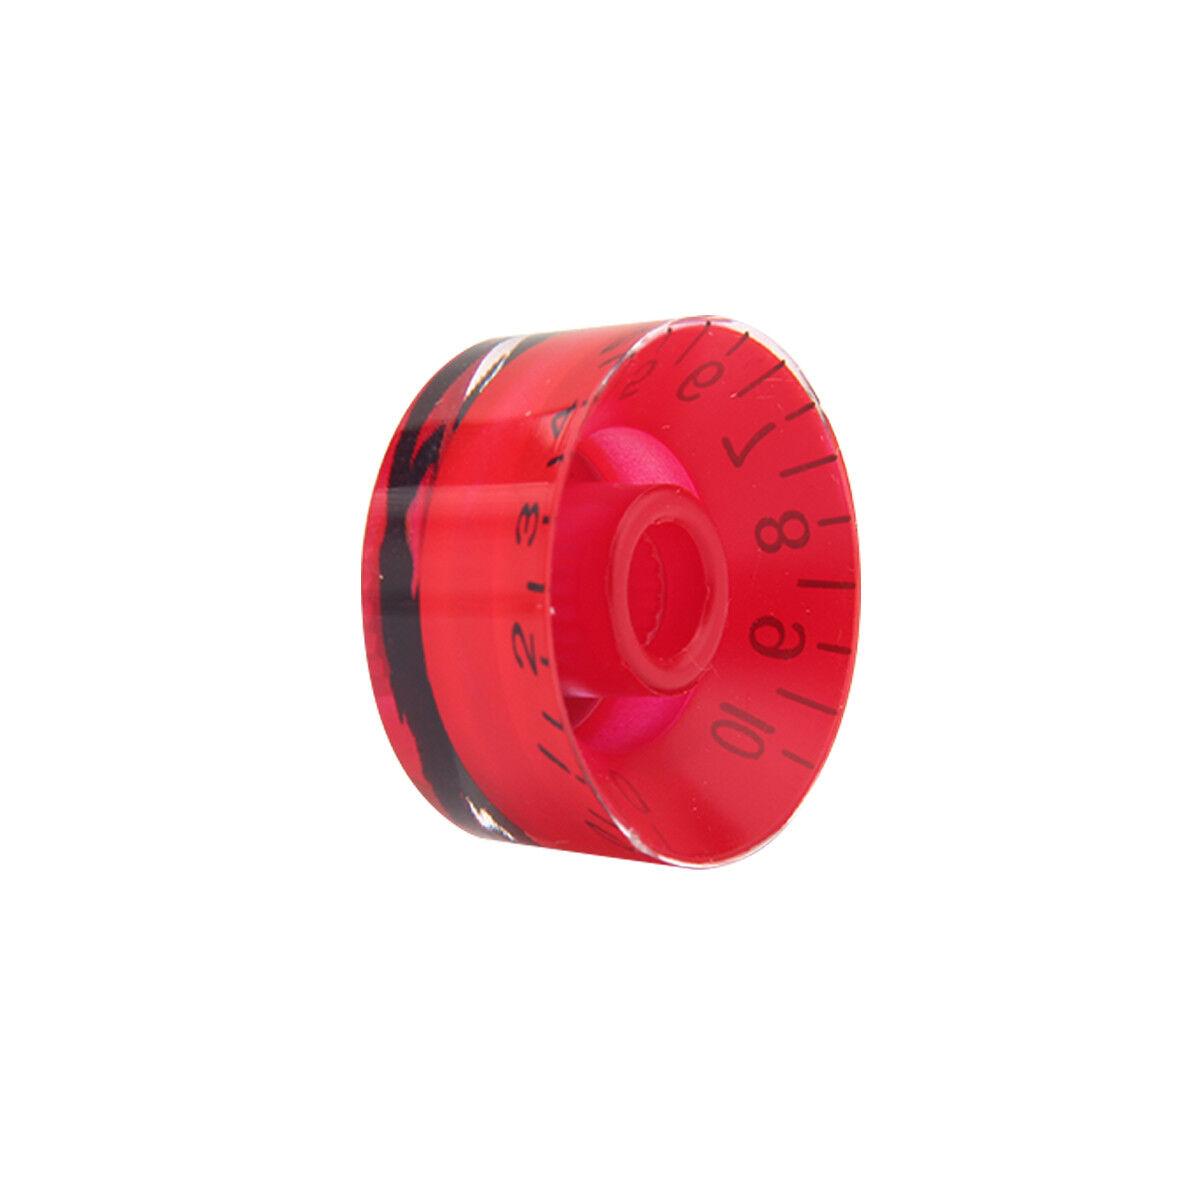 4 pcs volume tone guitar speed knobs knob with black che guevara mark red 634458584609 ebay. Black Bedroom Furniture Sets. Home Design Ideas